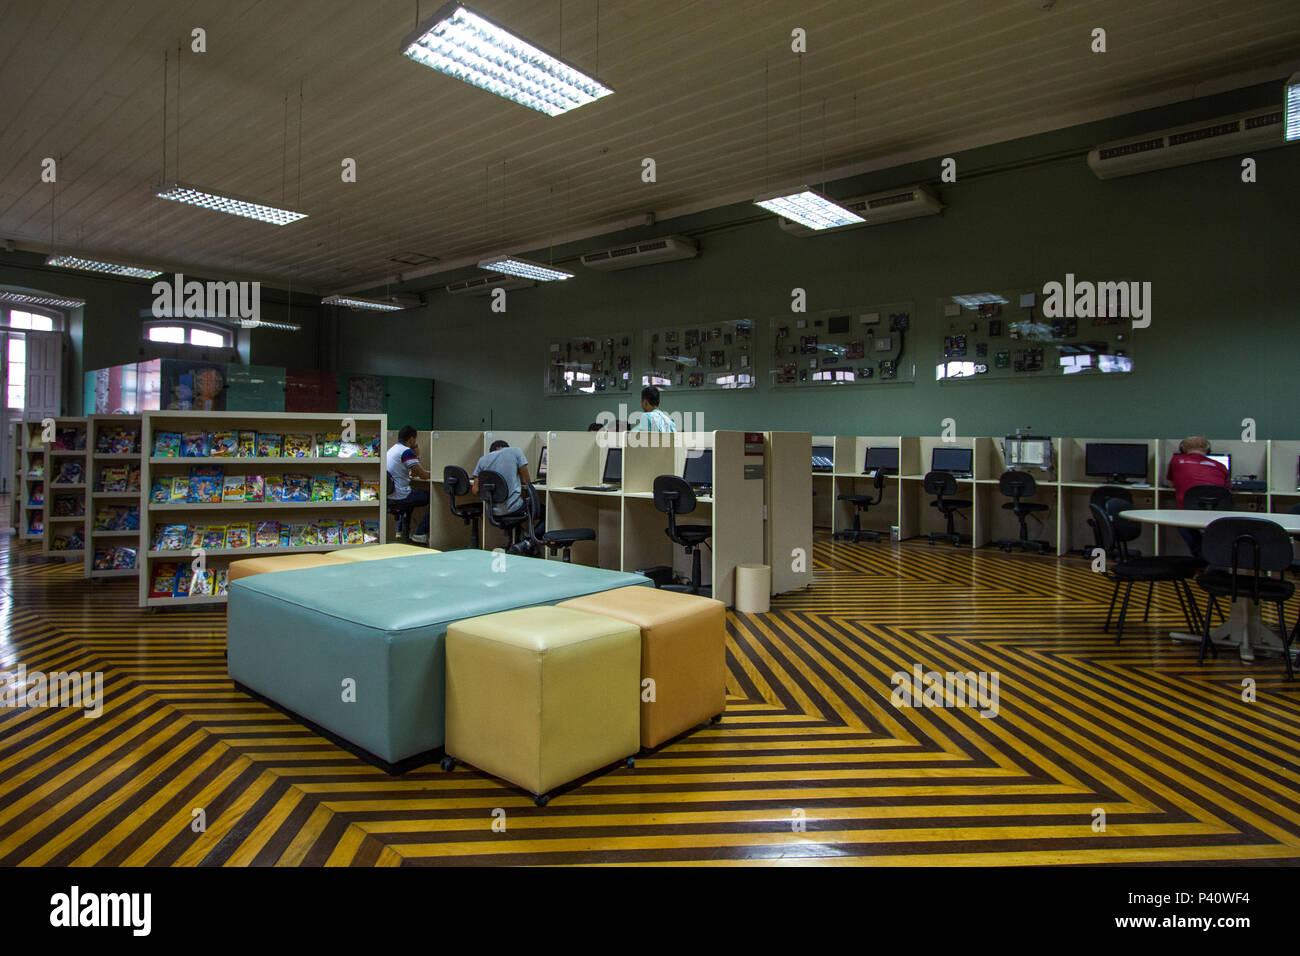 Manaus Am Biblioteca Biblioteca Pública Do Amazonas